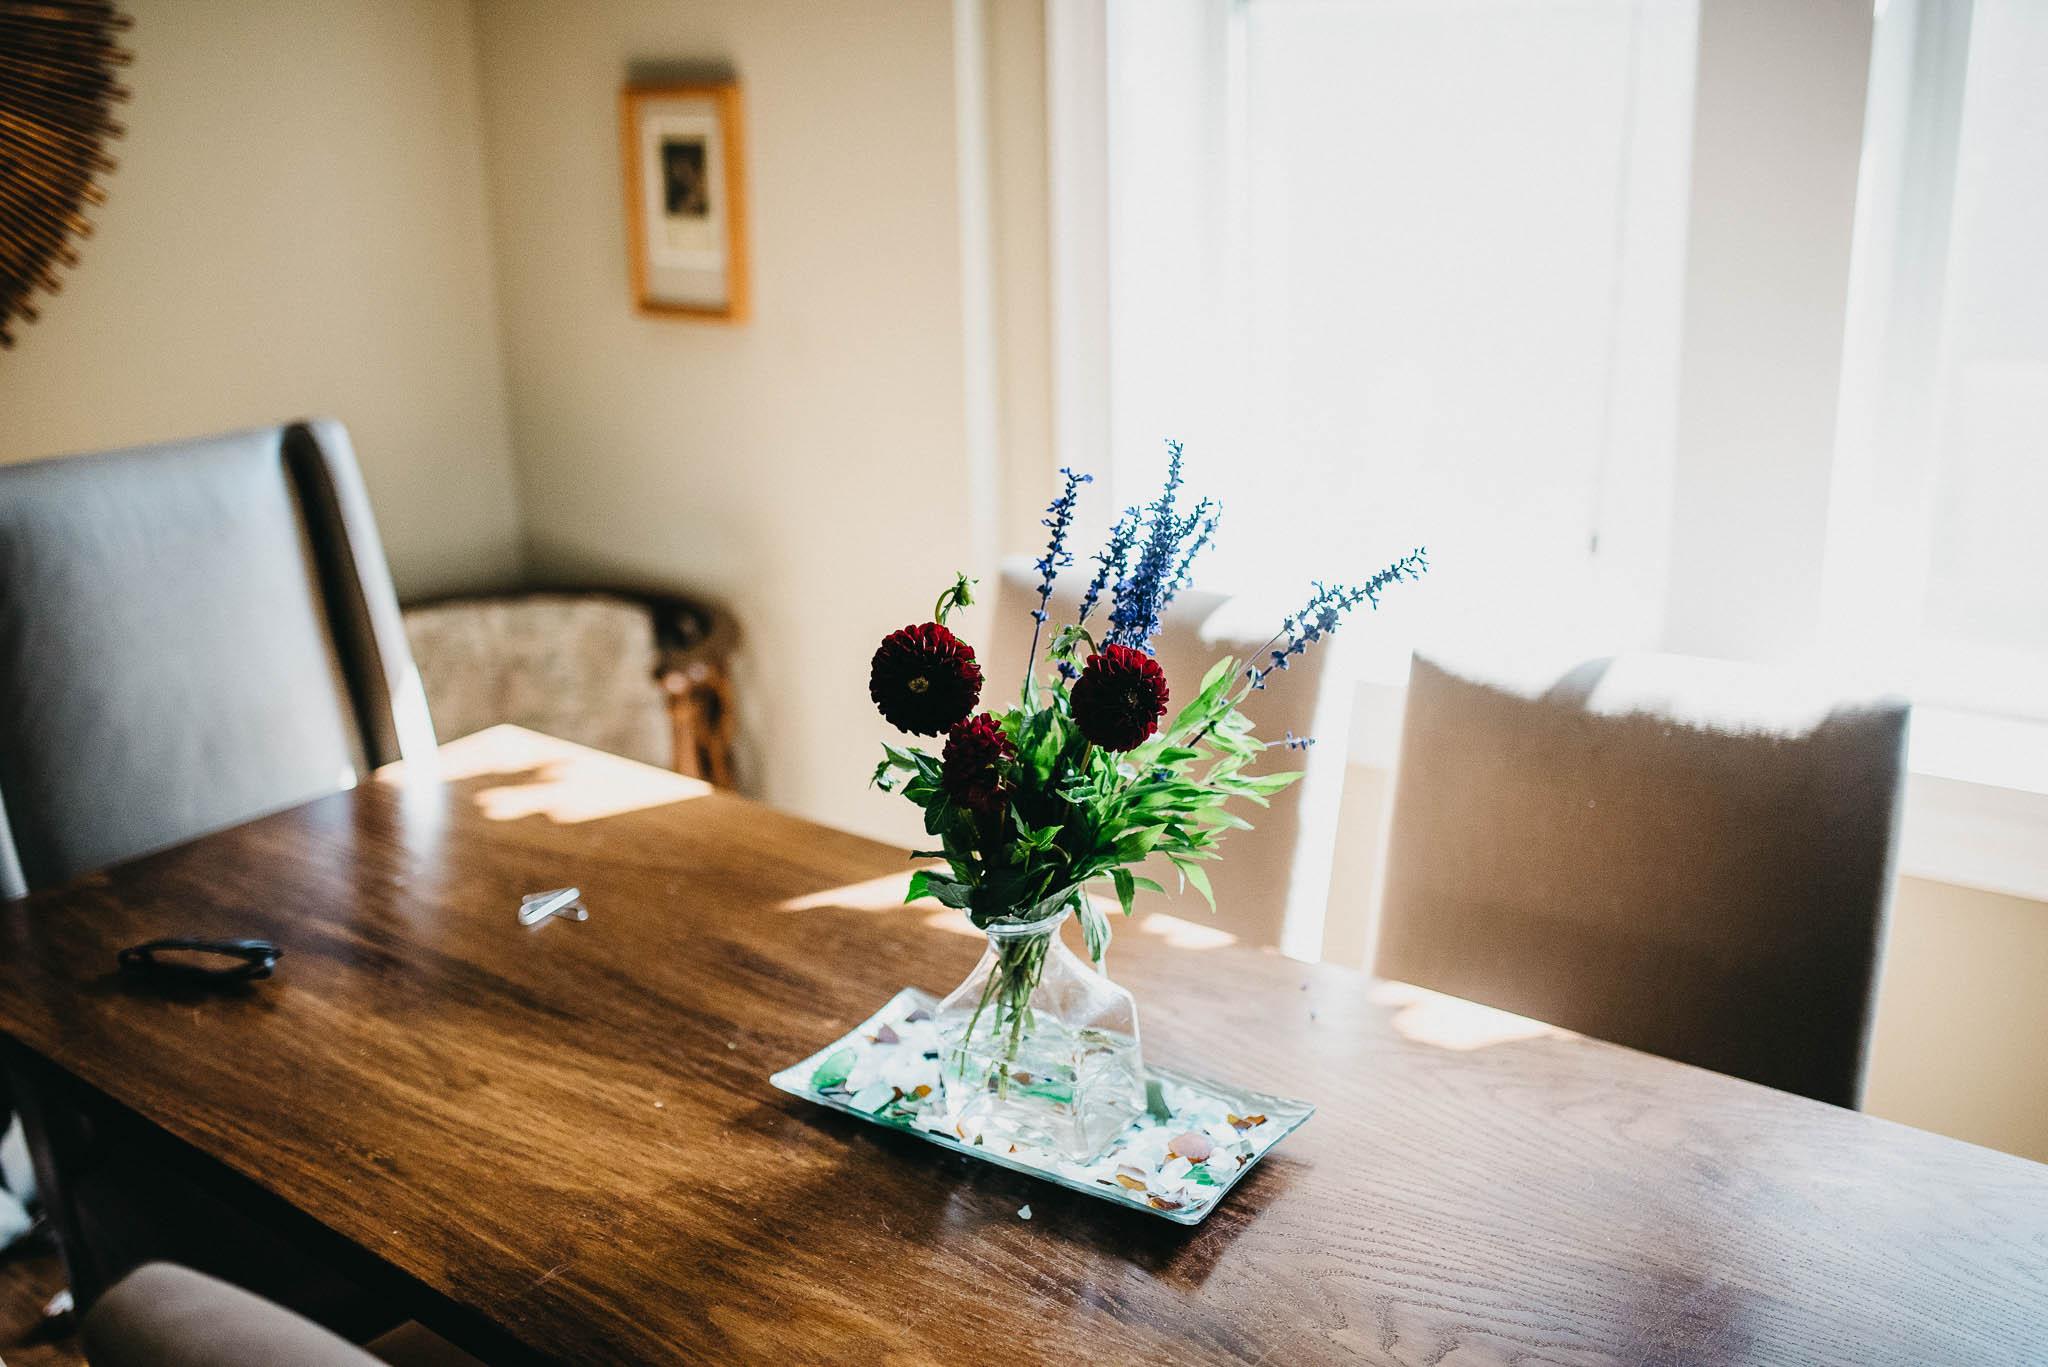 Arranged flowers on dining room table